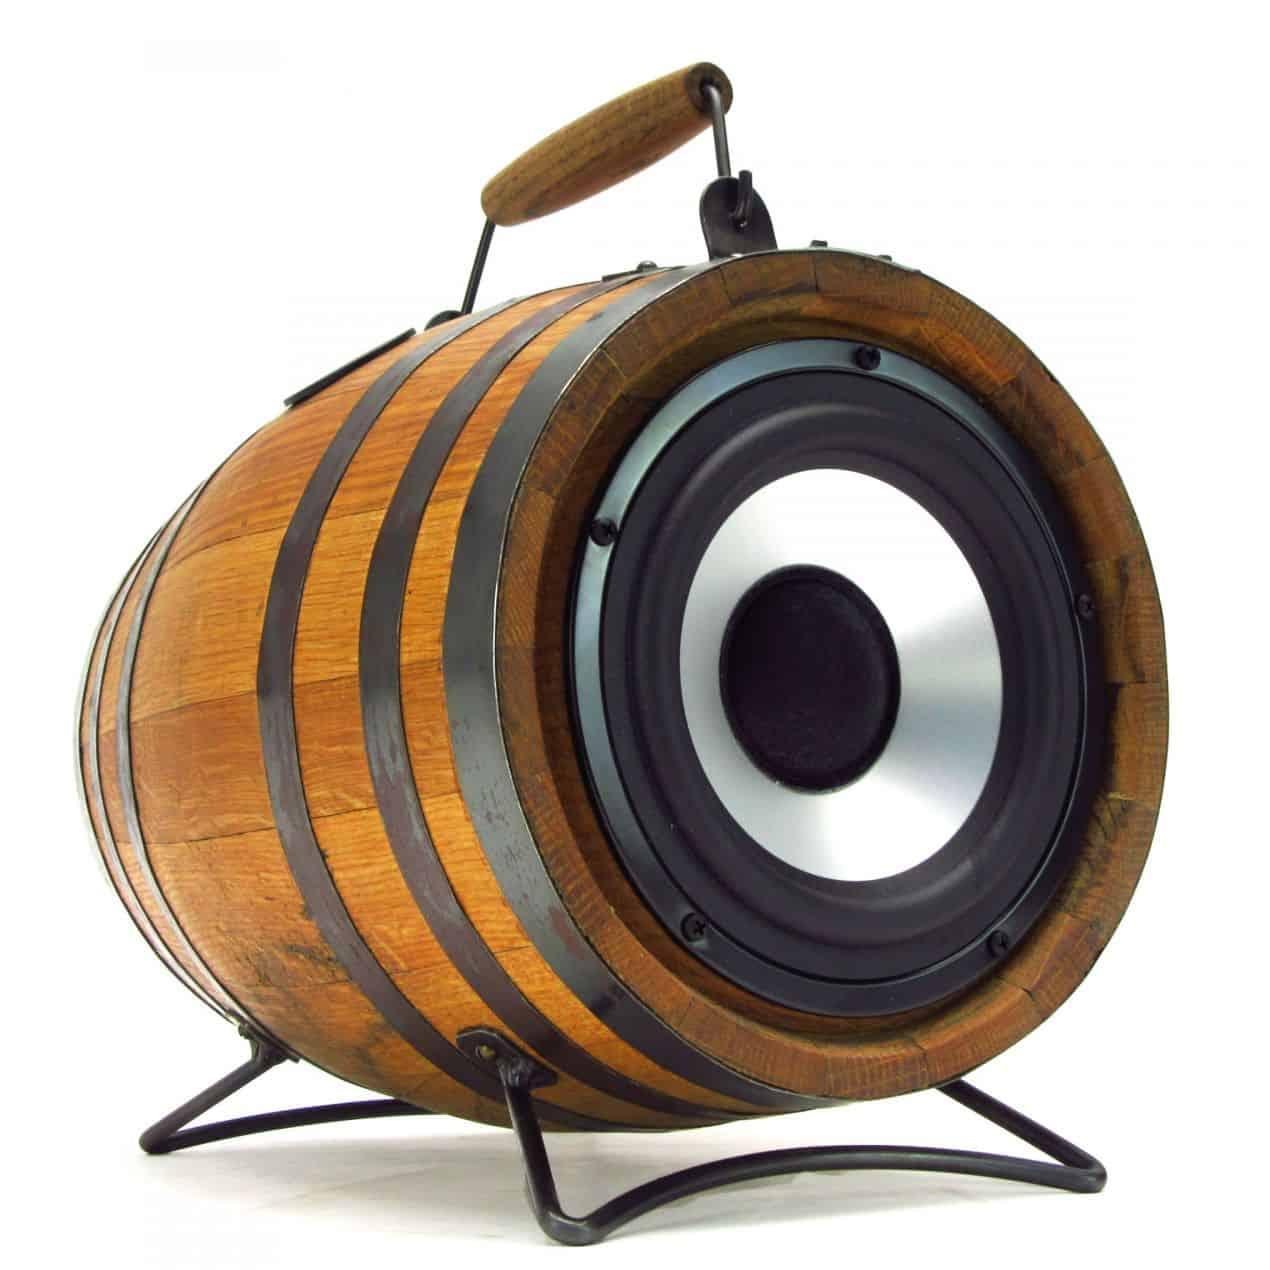 BoomBarrel sound system